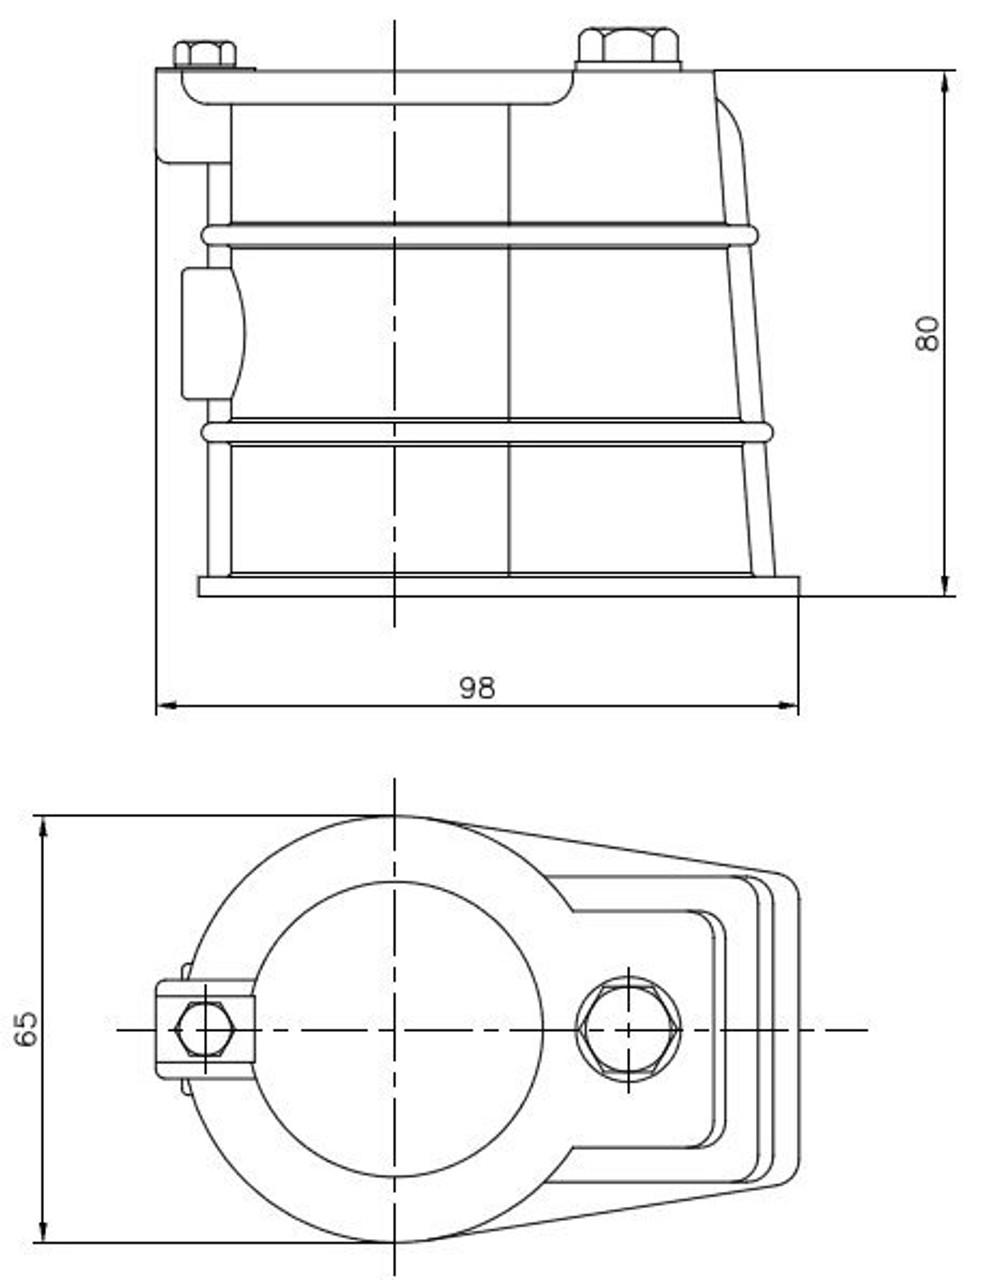 Optional grab rail anchor kit dimensions